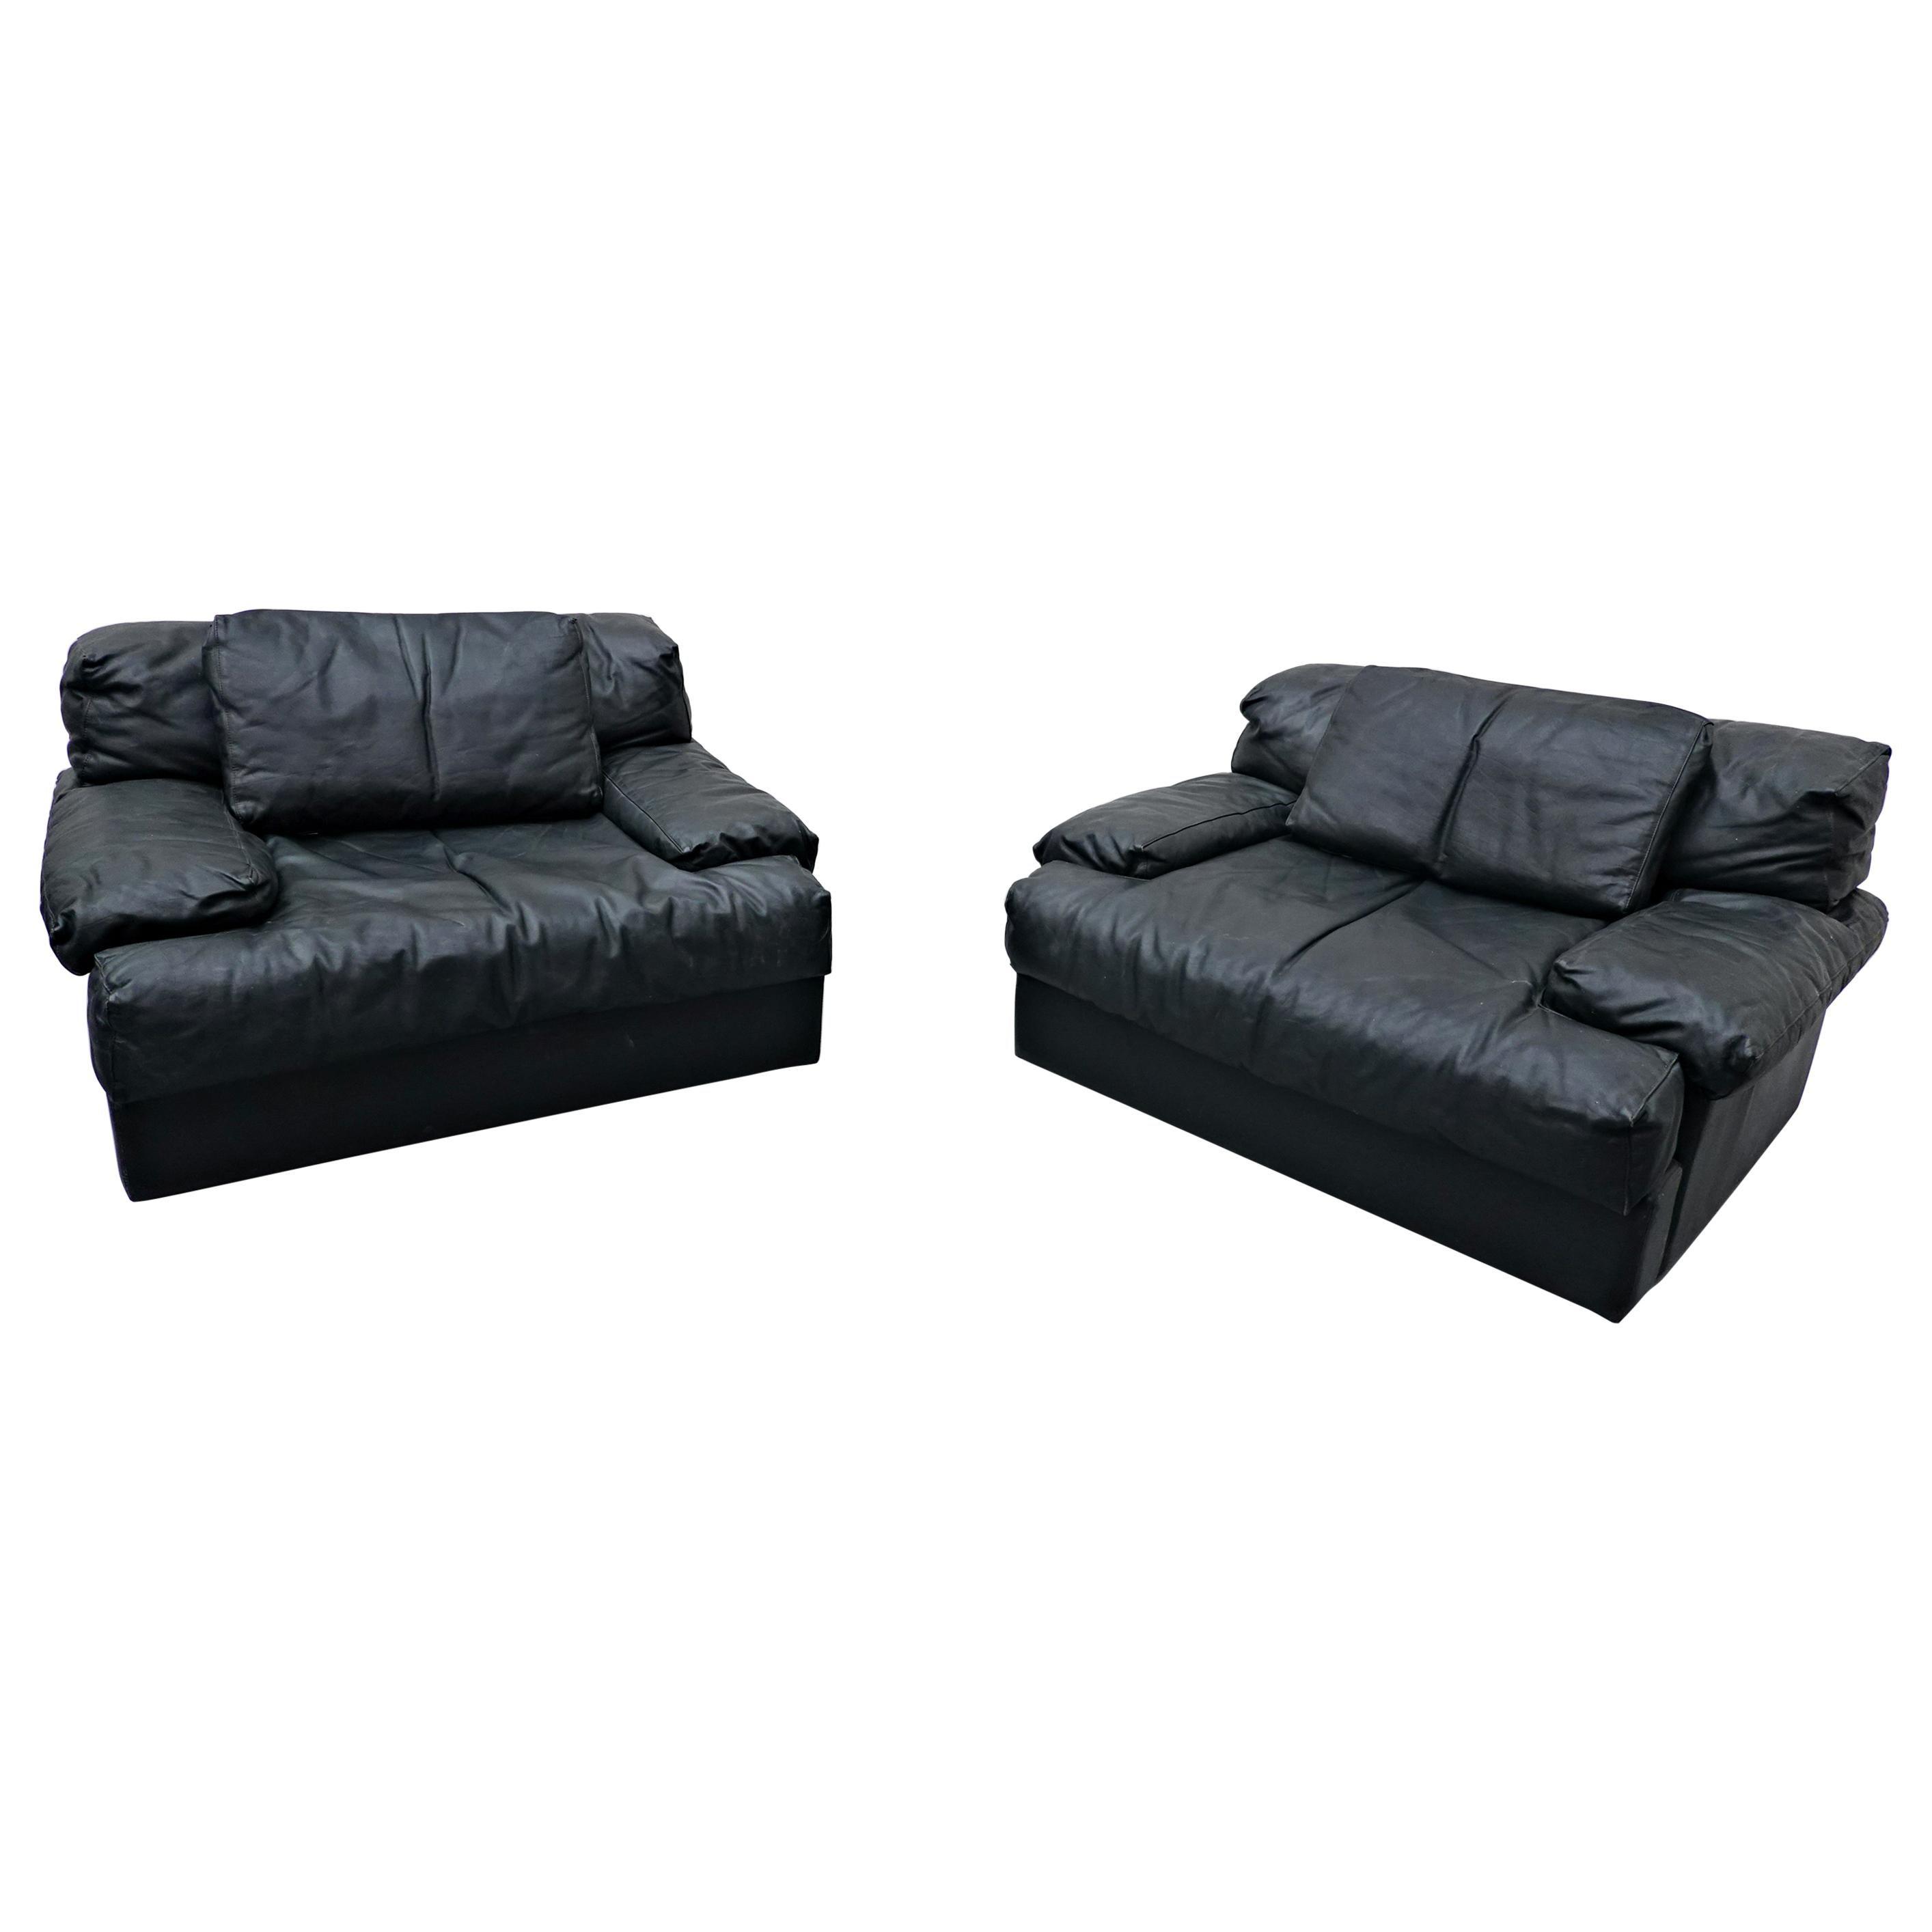 Pair of Italian Mid-Century Modern Armchairs, Black Leather, 1960s